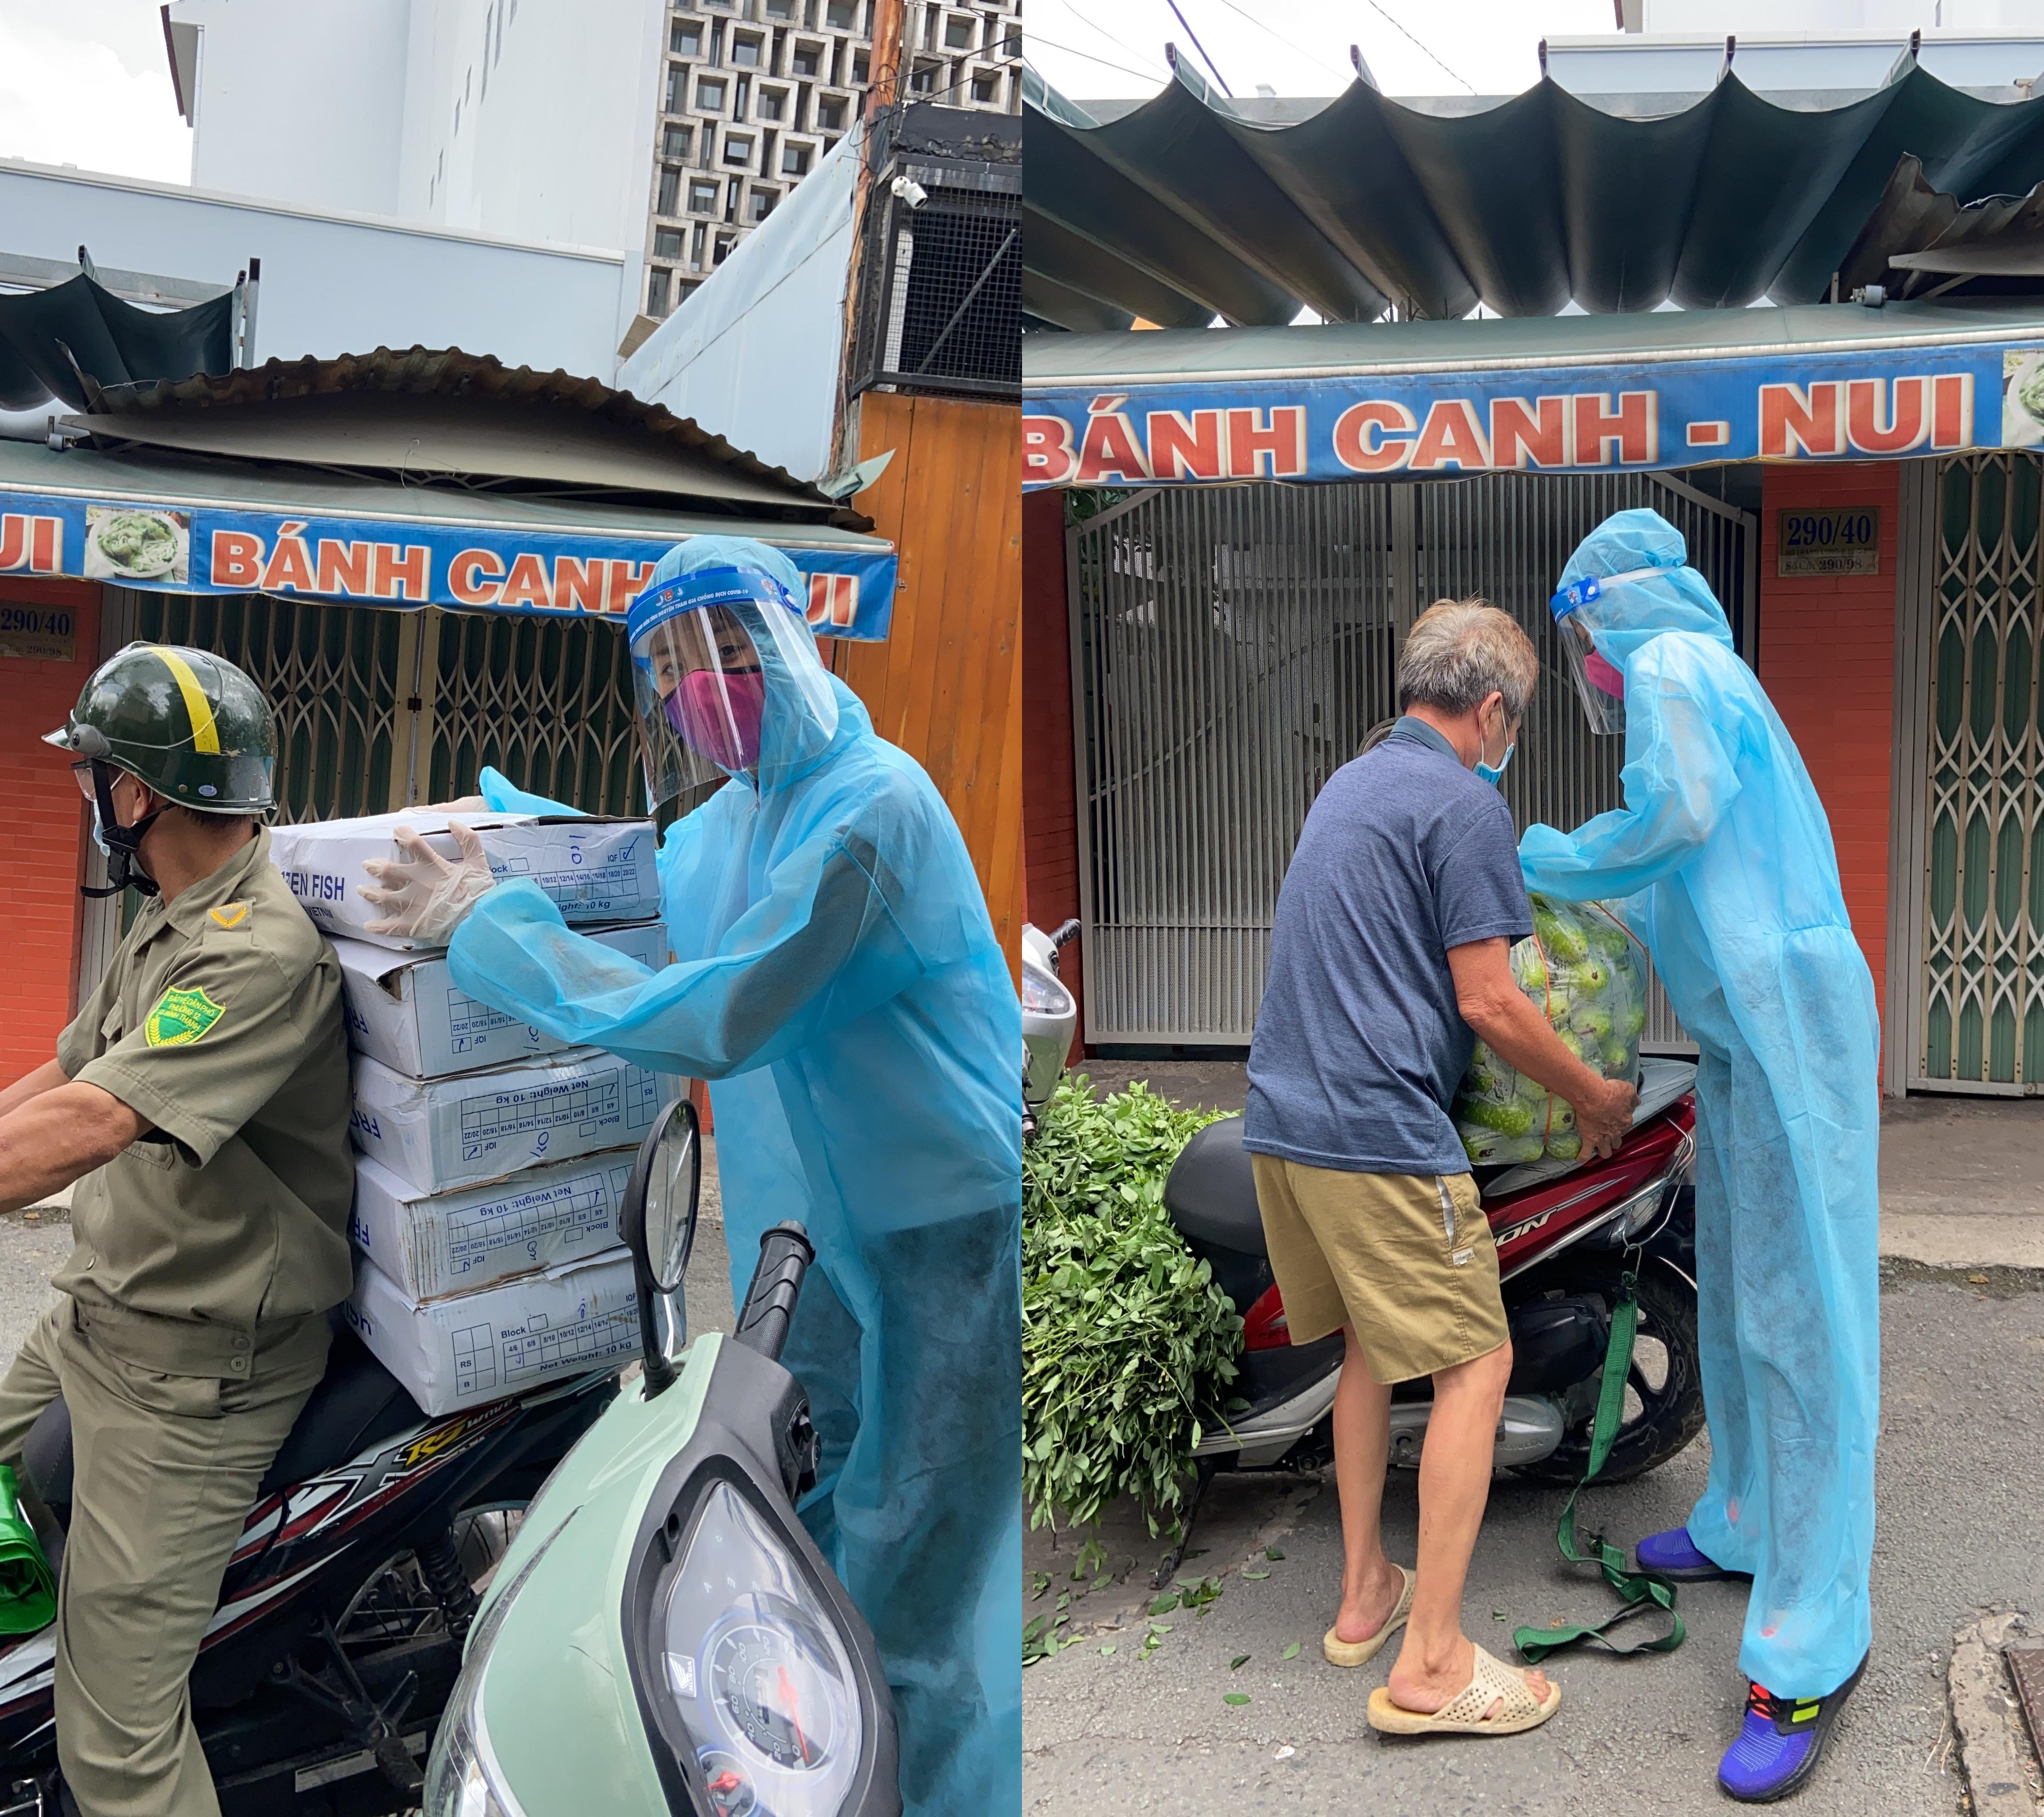 Hoa hau Khanh Van_Chuyen xe thuc pham 0 dong97-horz